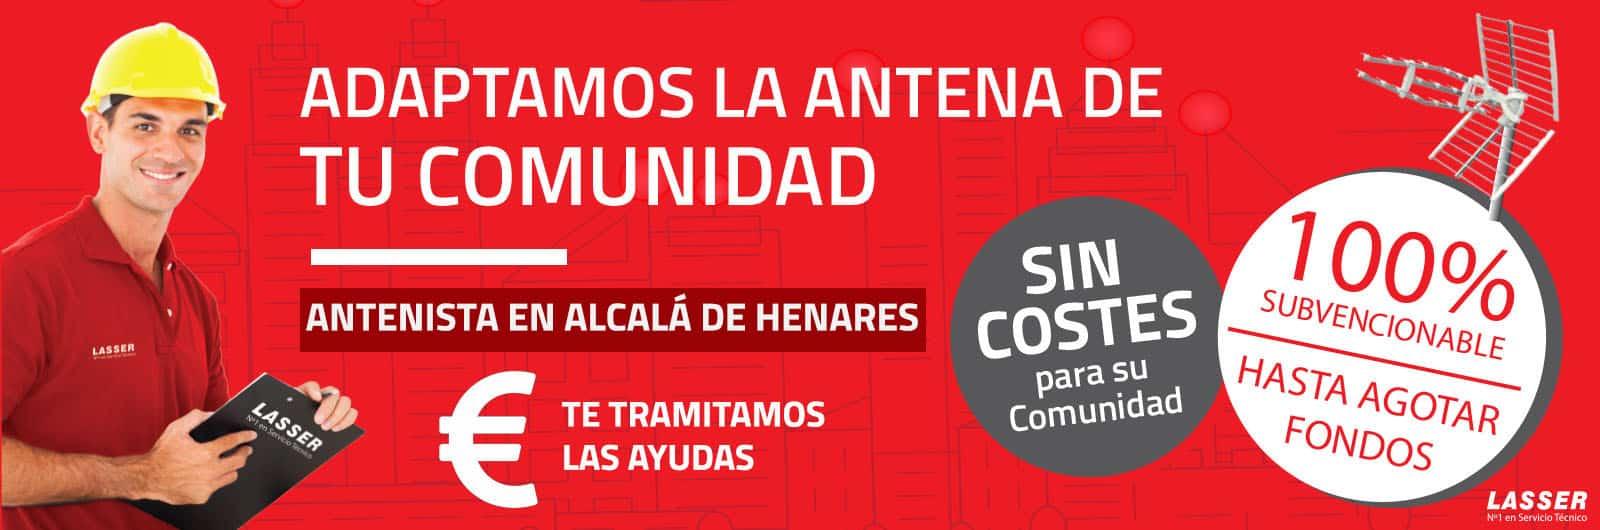 segundo-dividendo-digital-antena-comunidades-promocion-alcala-de-henares